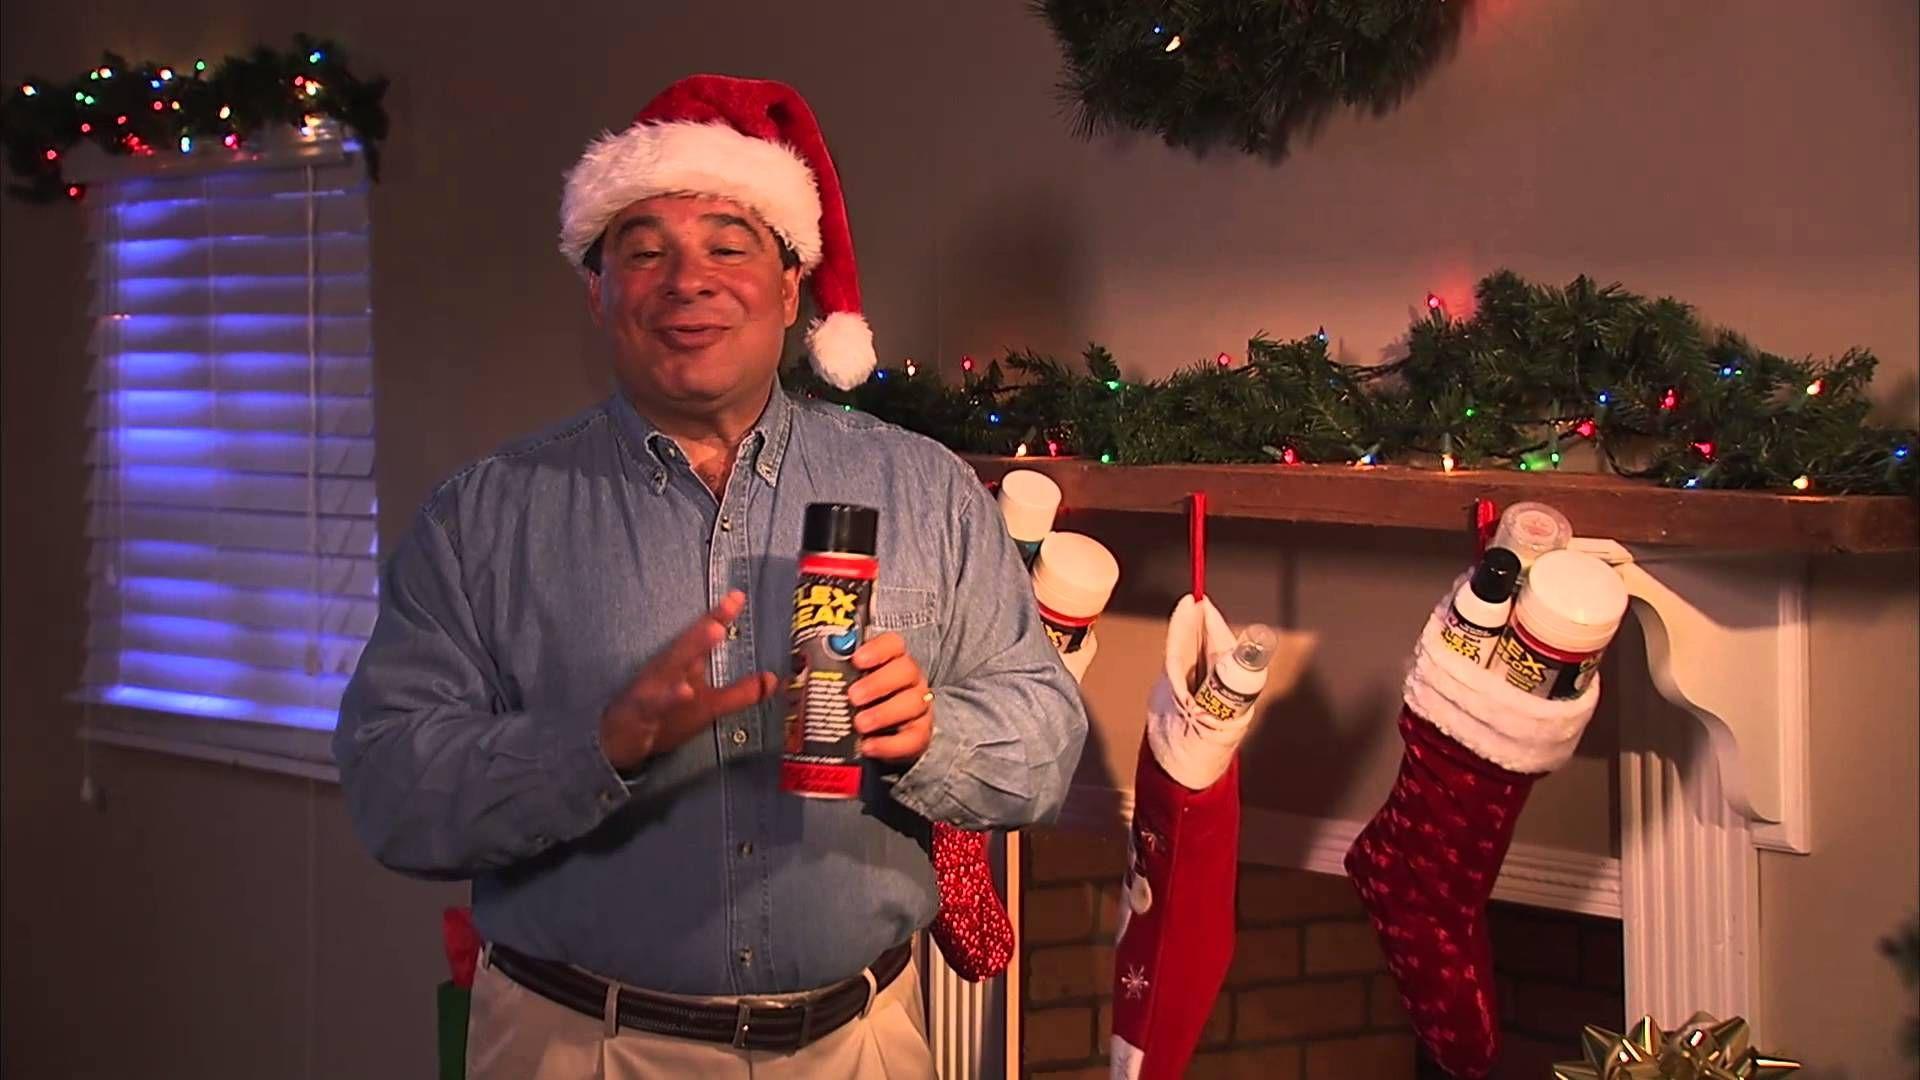 Flex Seal Christmas Commercial 2020 Flex Seal Flex Shot Holiday | Flex, Christmas sweaters, Holiday